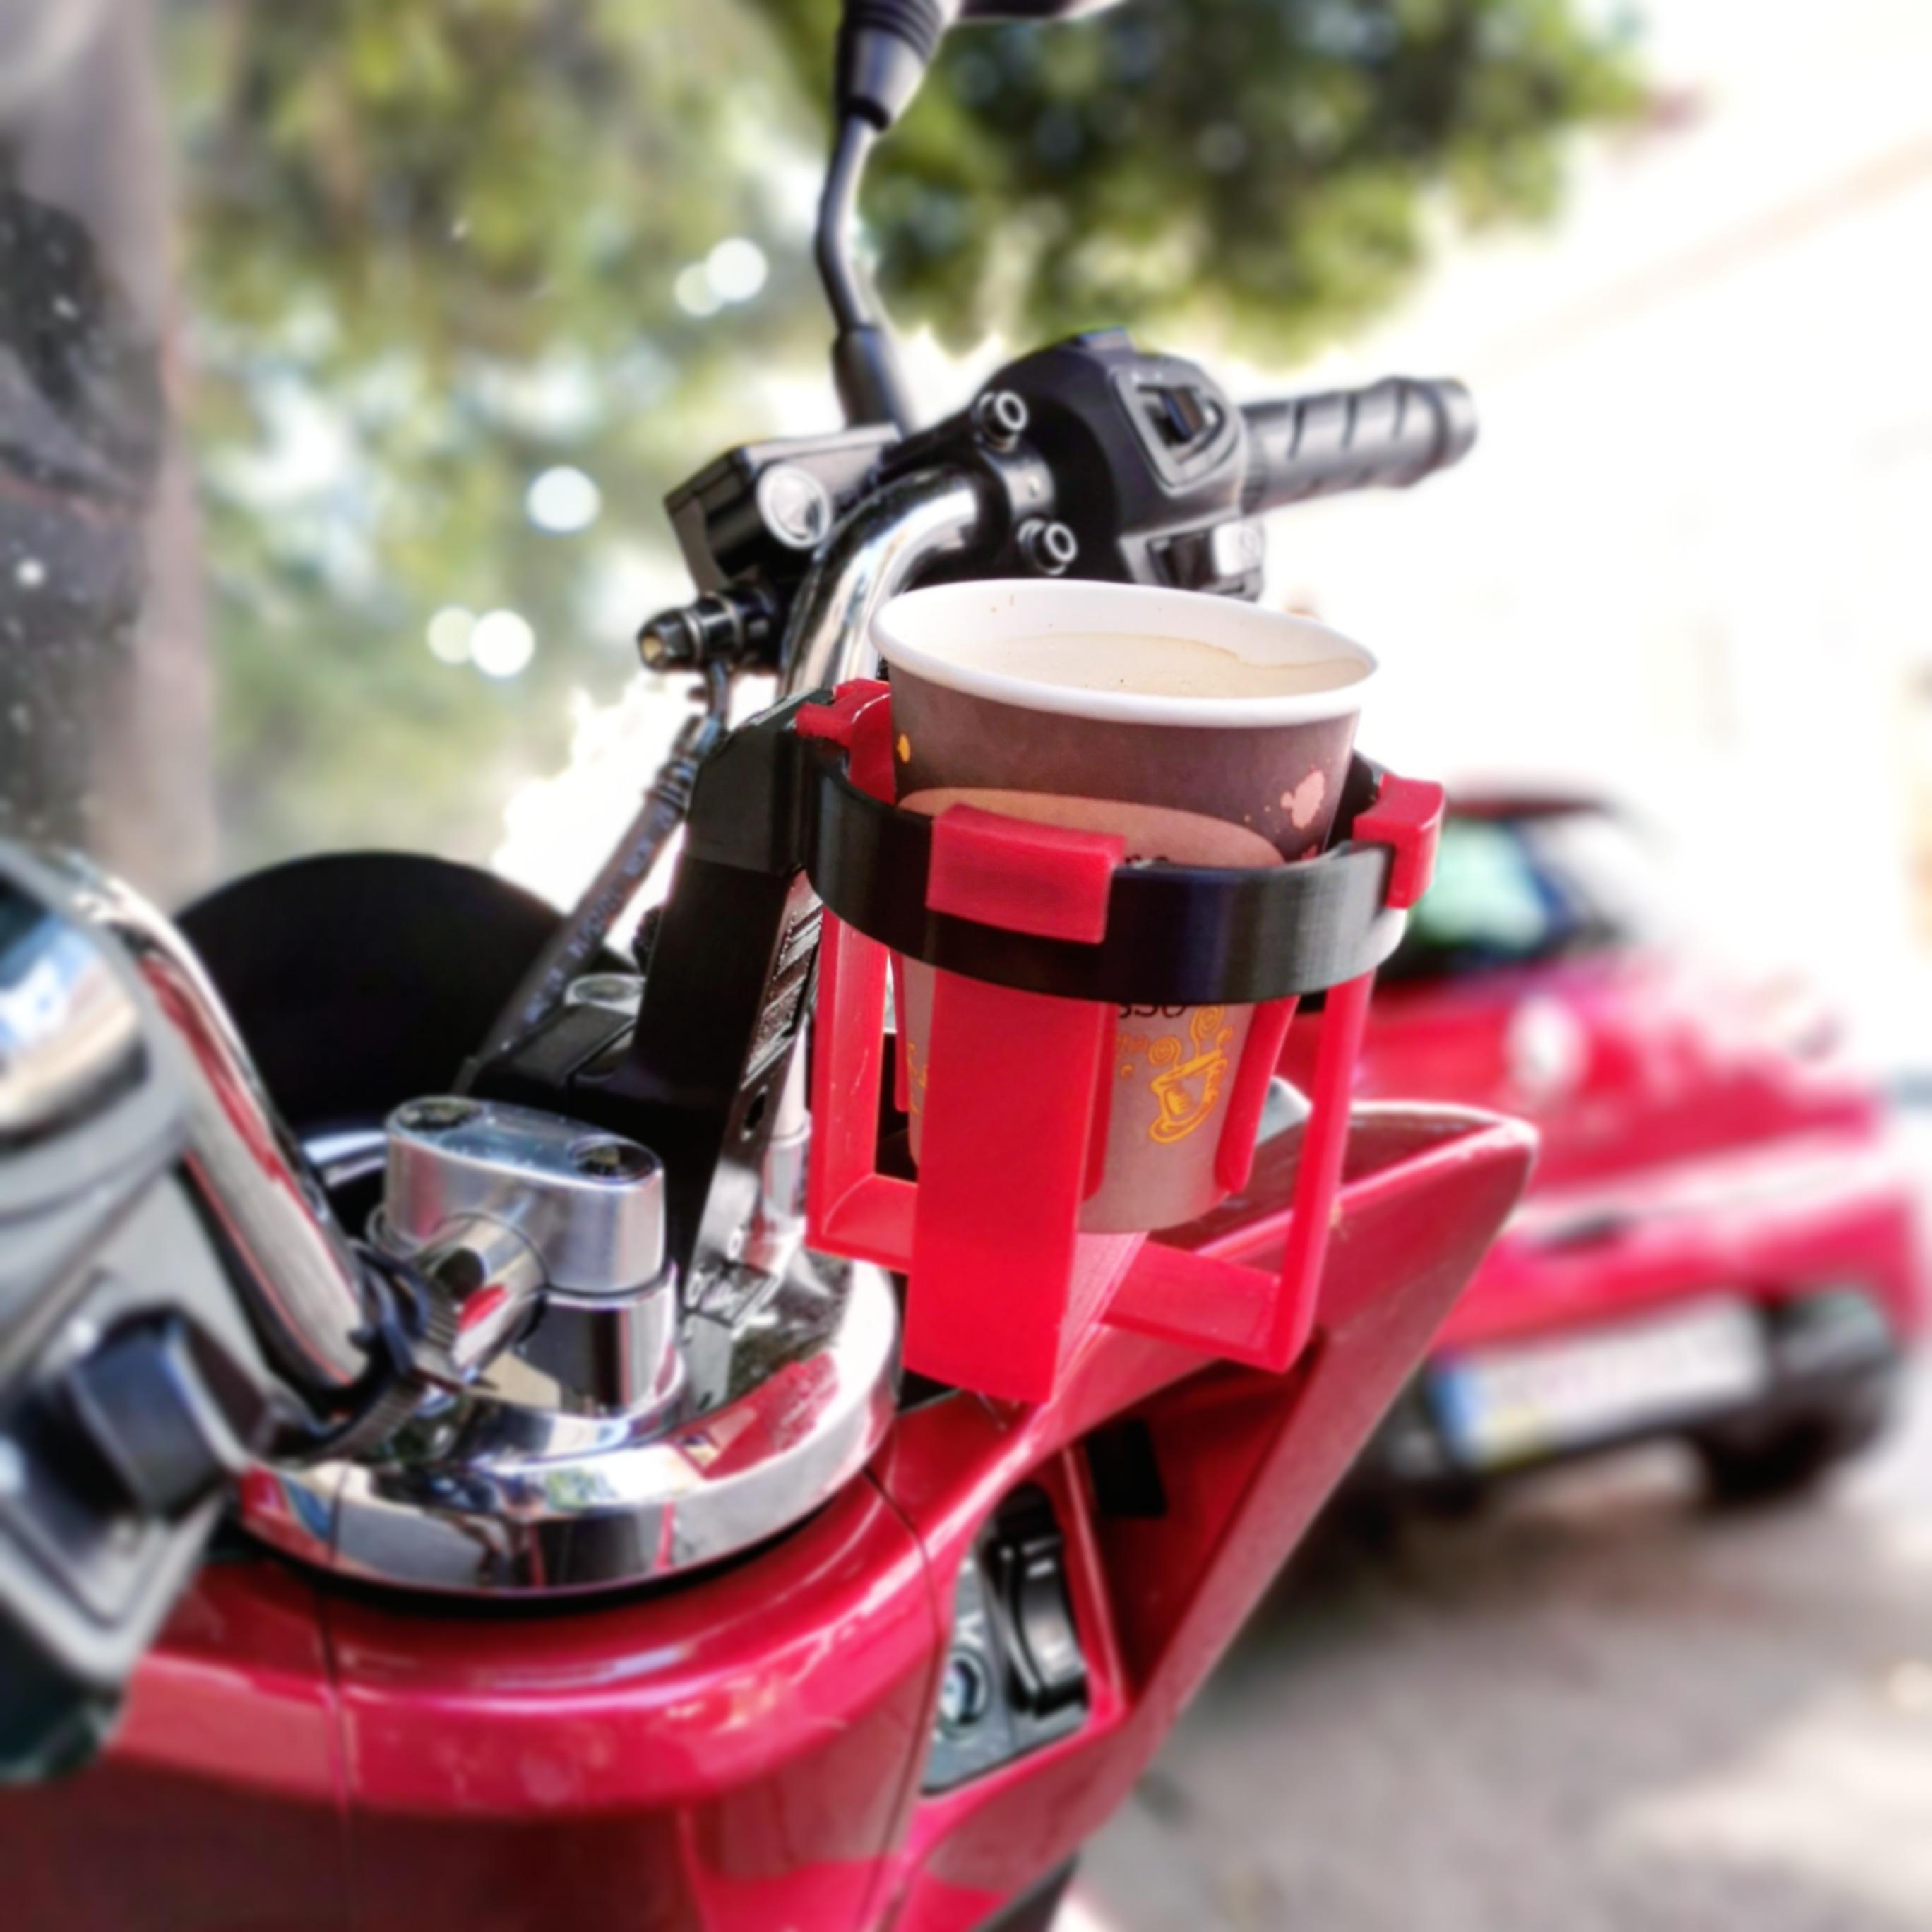 Honda 125 cup holder